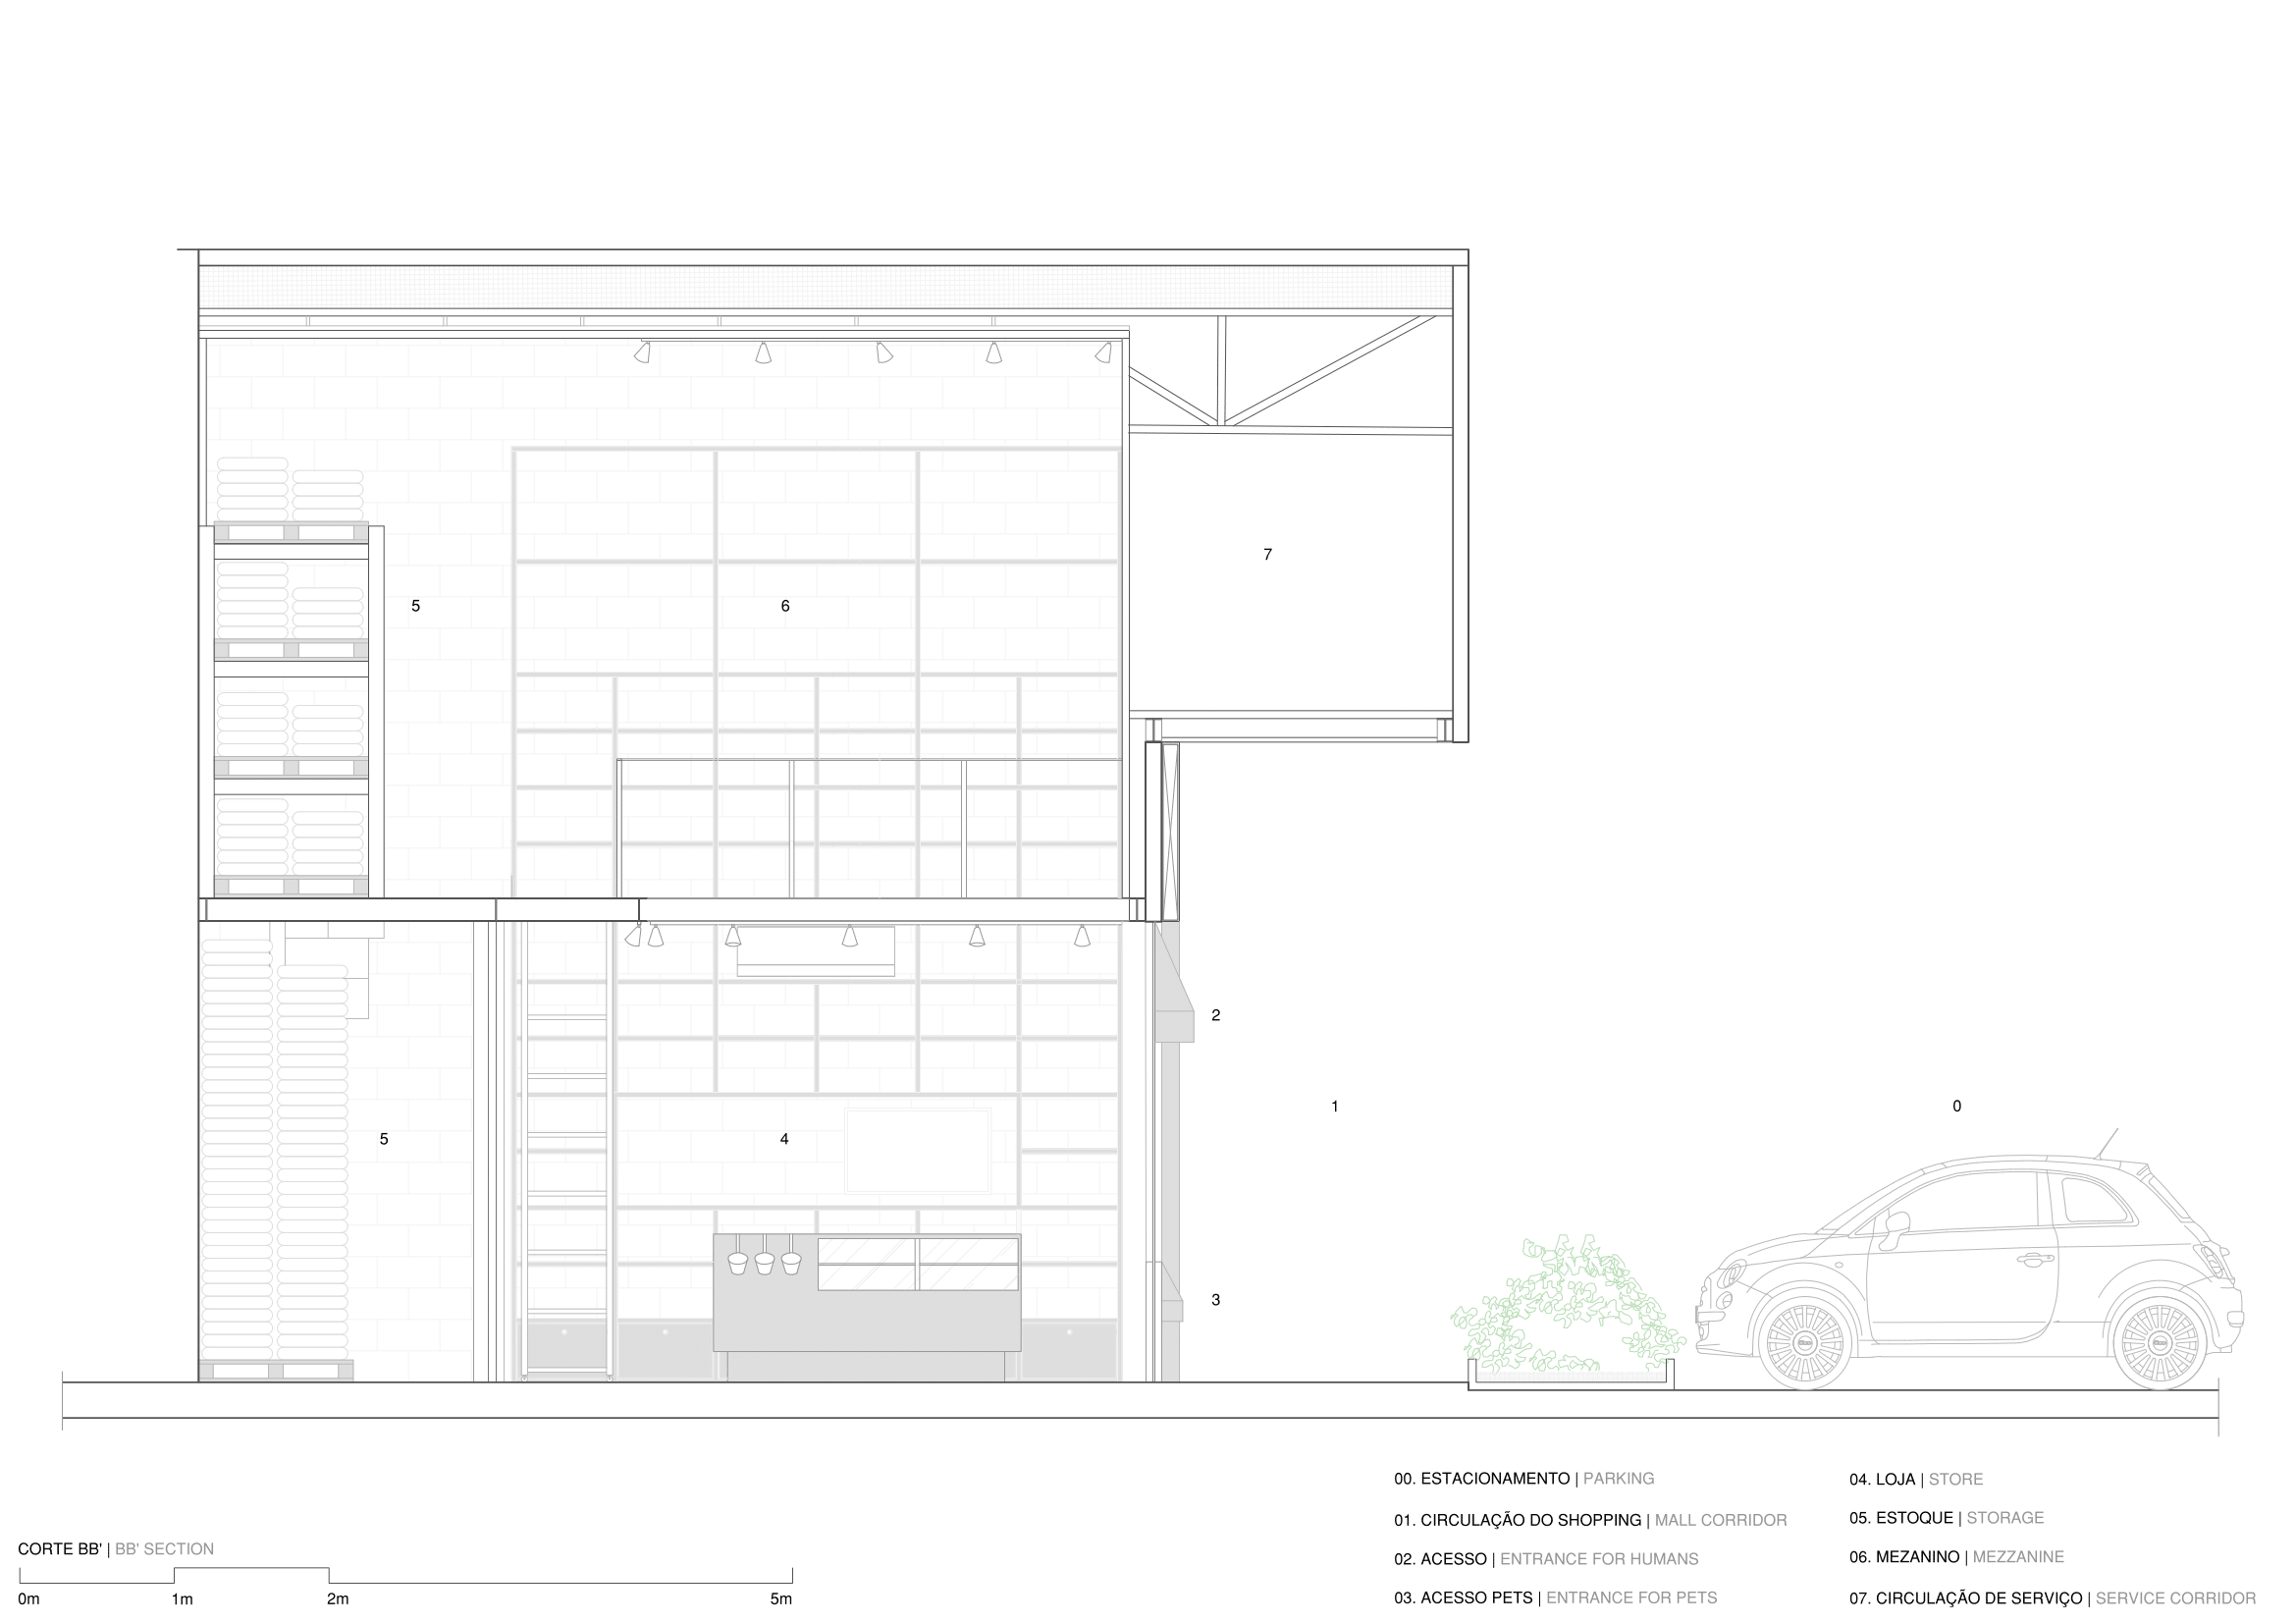 hobjeto-arquitetura-loja-maniadebicho-ap-05-cortebb